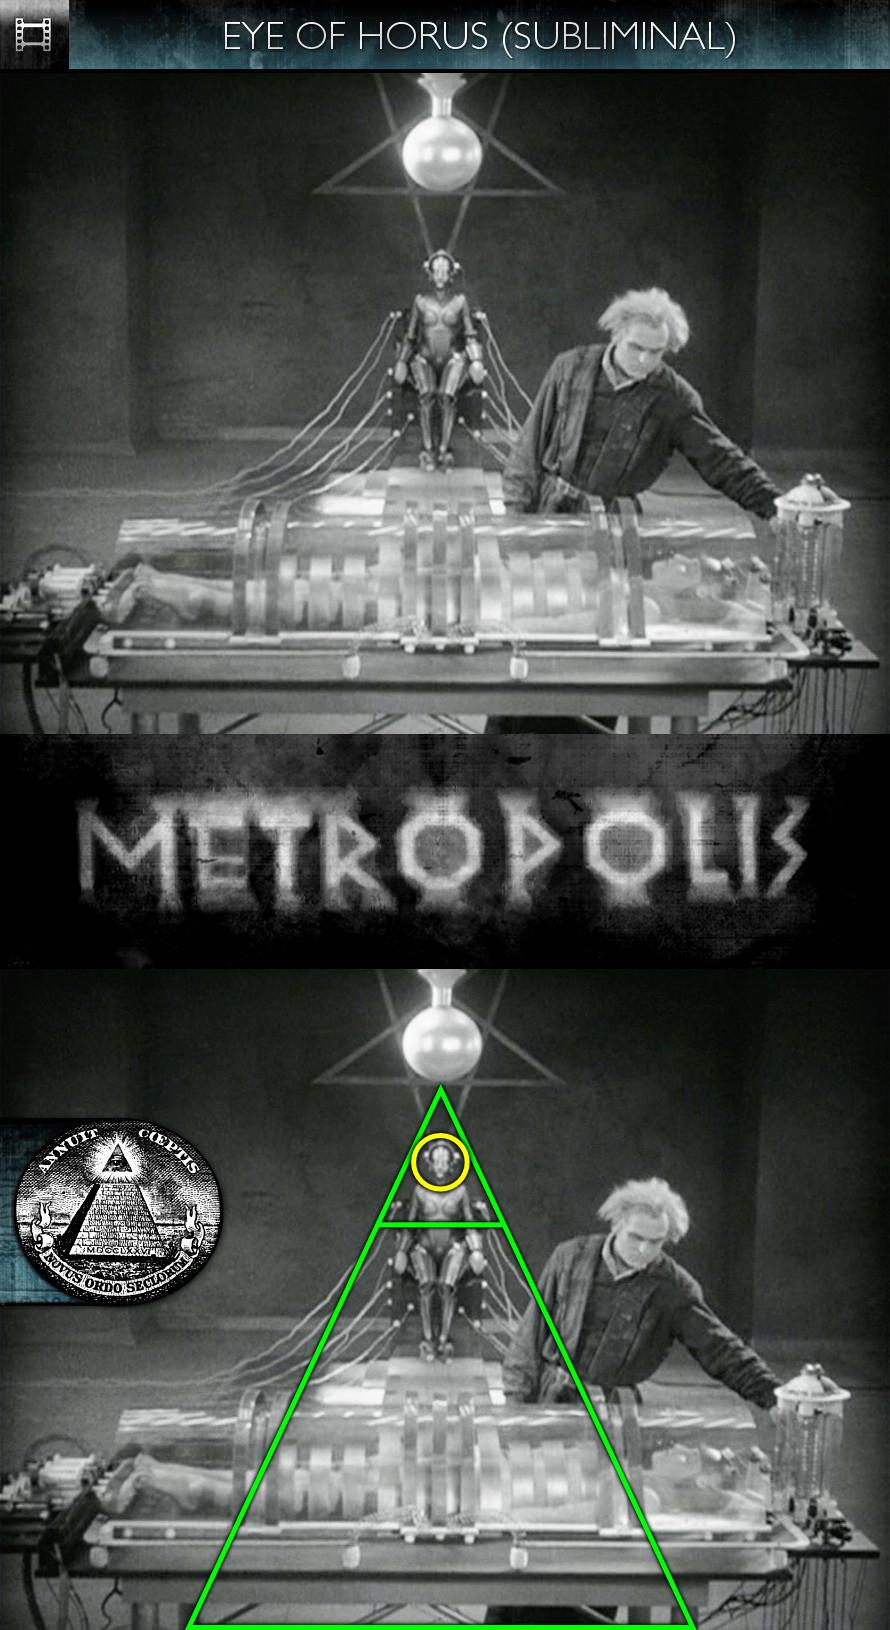 Metropolis (1927) - Eye of Horus - Subliminal